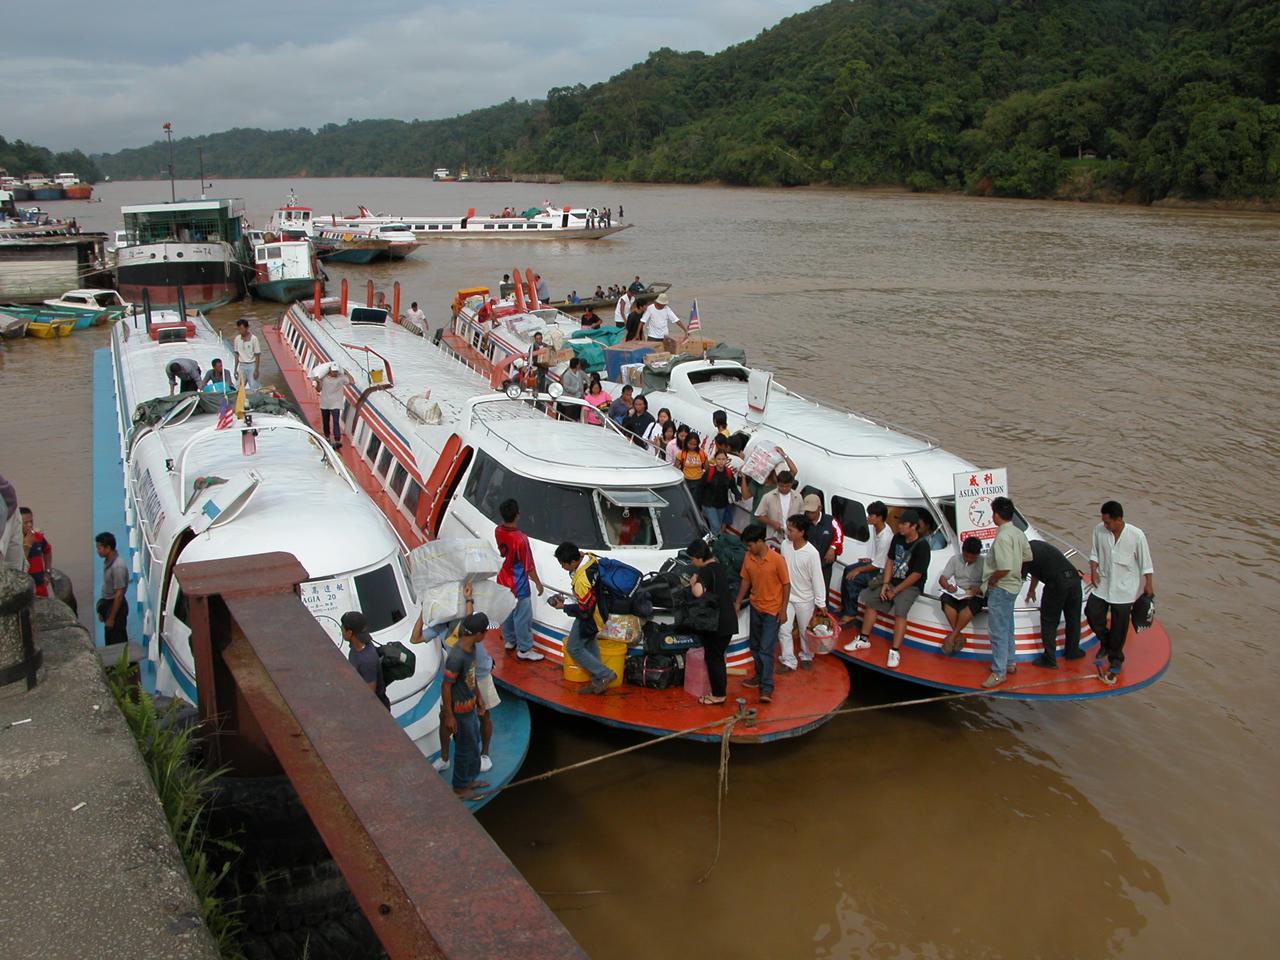 Maleisië, vertrek met de boot vanuit Kapit terug naar Sibu - Sarawak